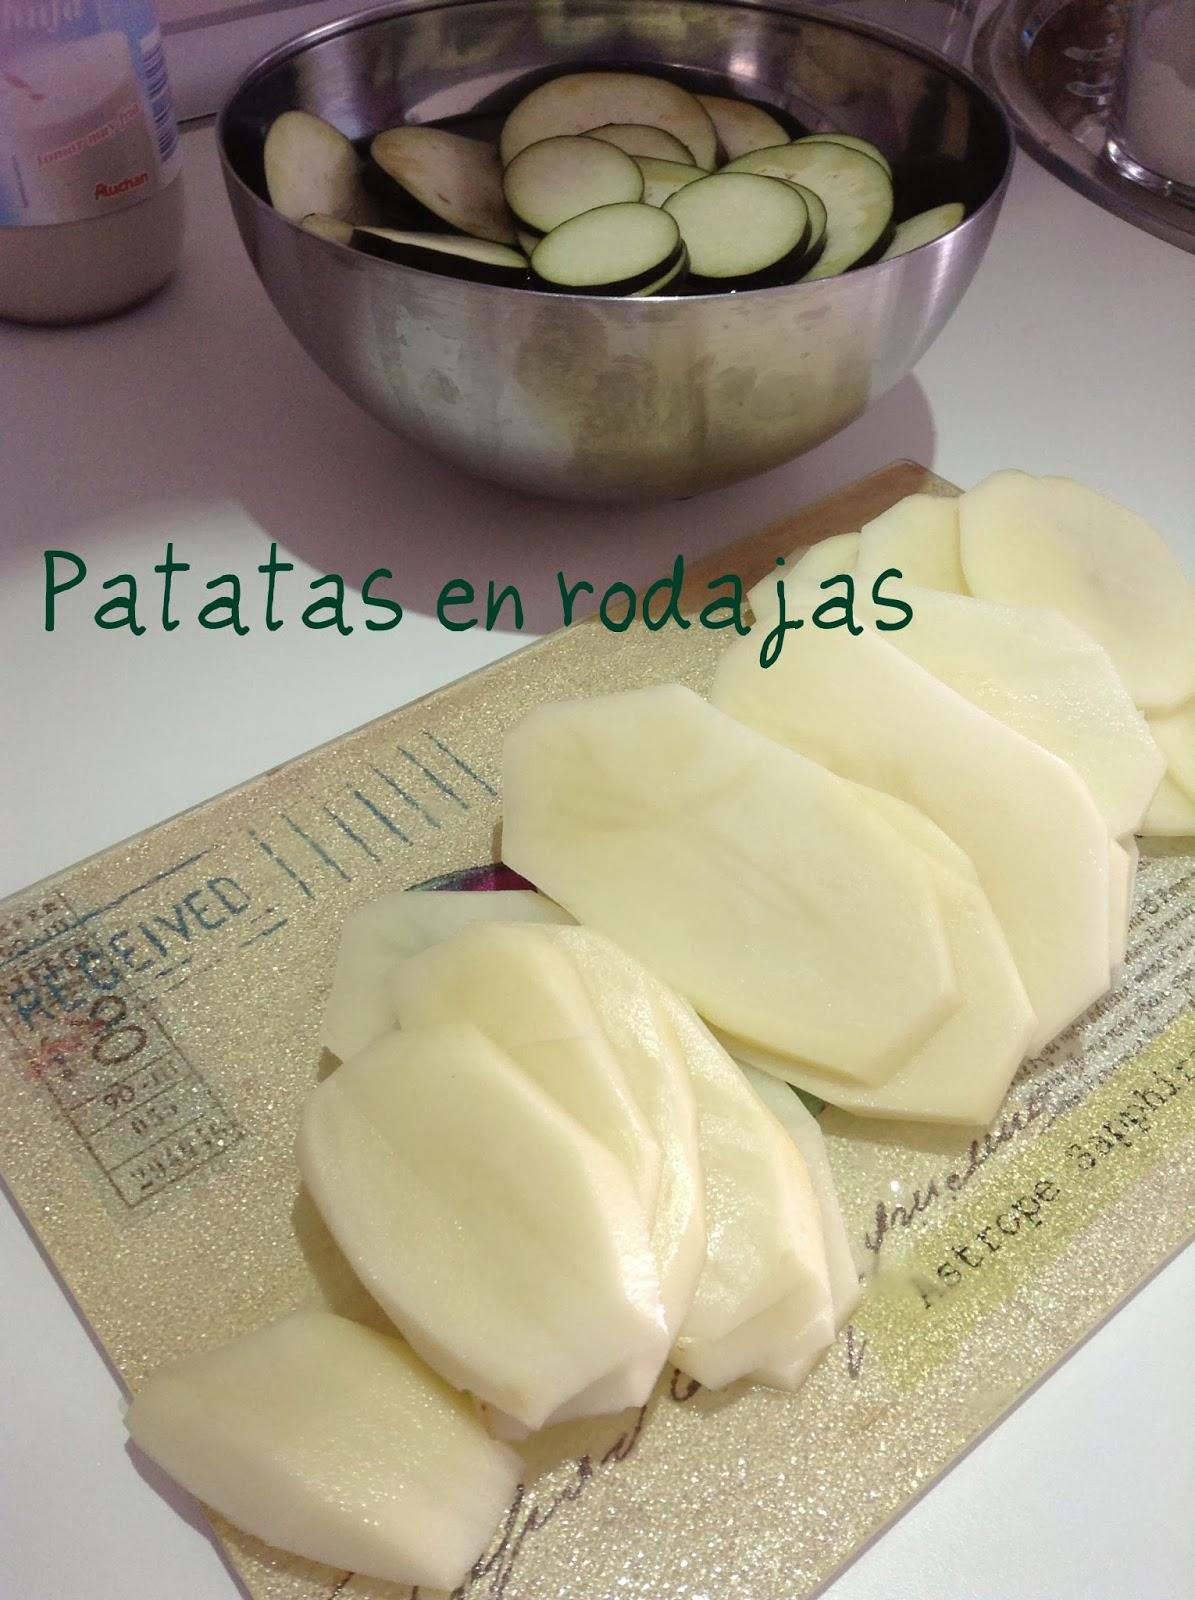 Patatas en rodajas